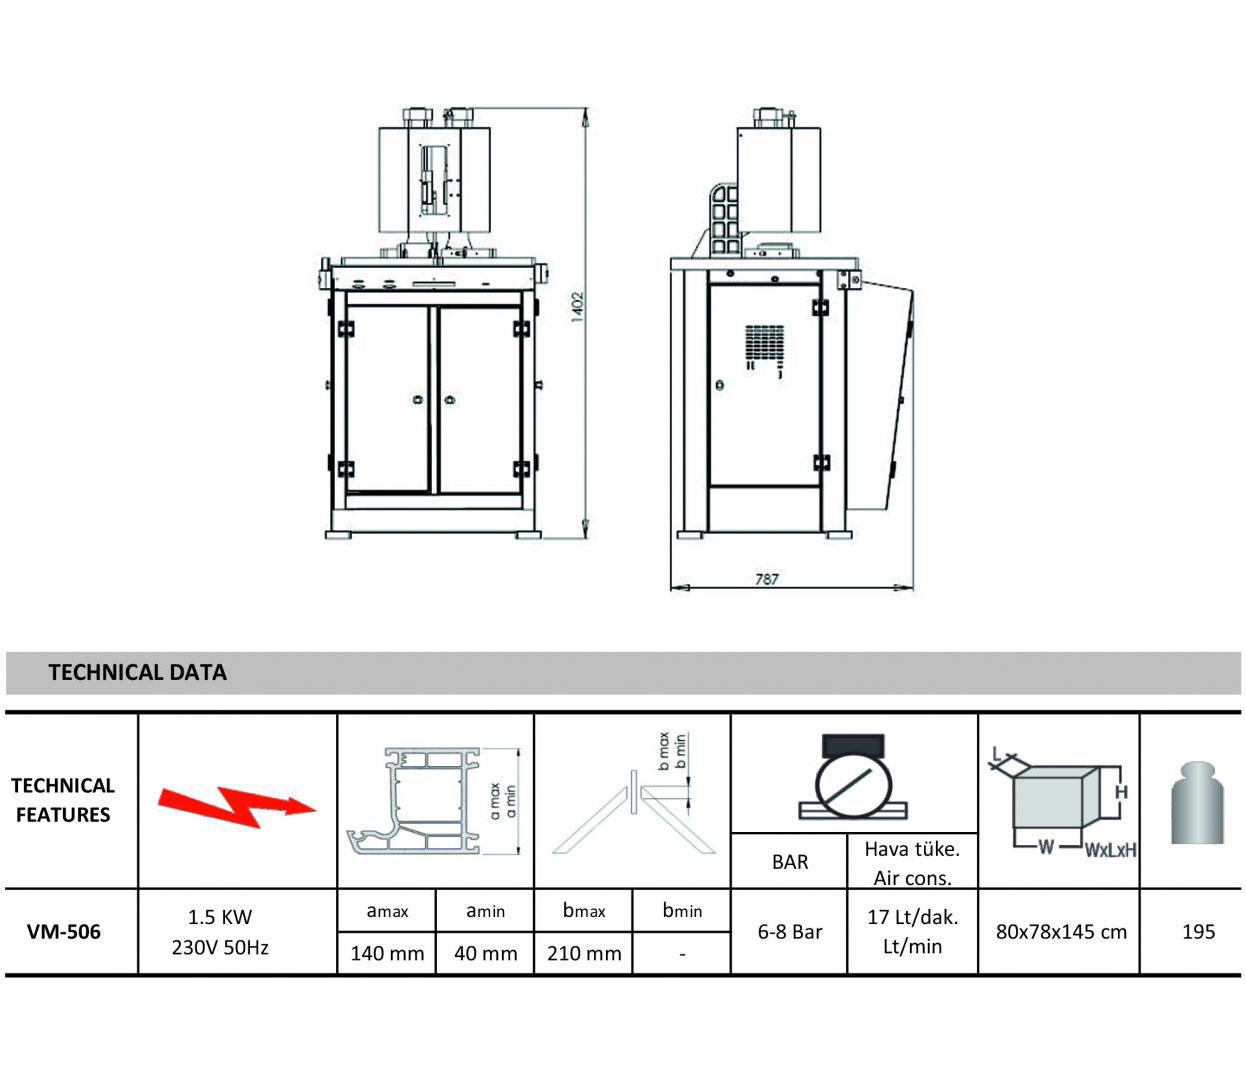 MSA-PRO Masina de sudat profile automata cu limitarea sudurii la 0.2 mm, seria PRO, 220V